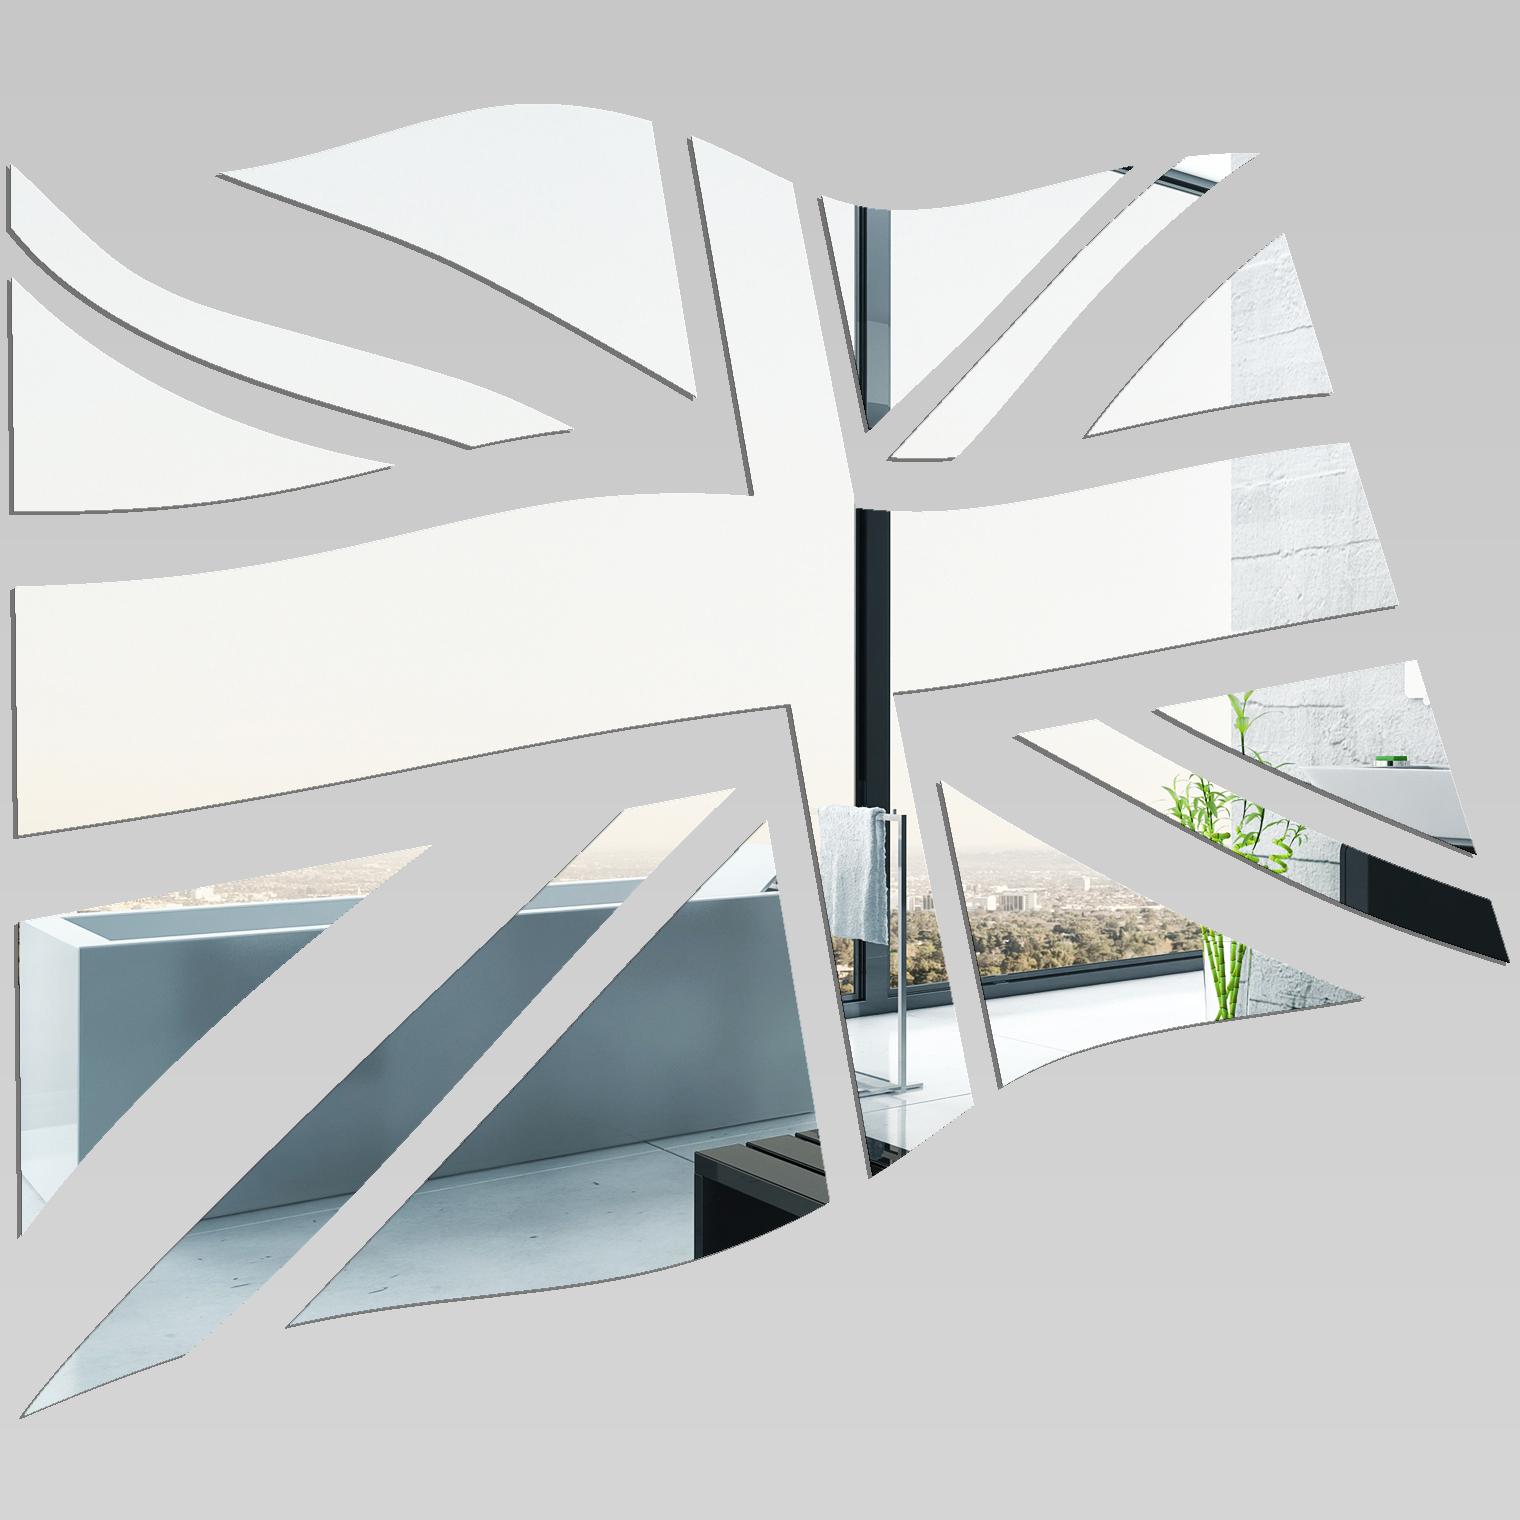 Wandtattoos folies wandspiegel aus acrylglas englisch flagge for Spiegel englisch